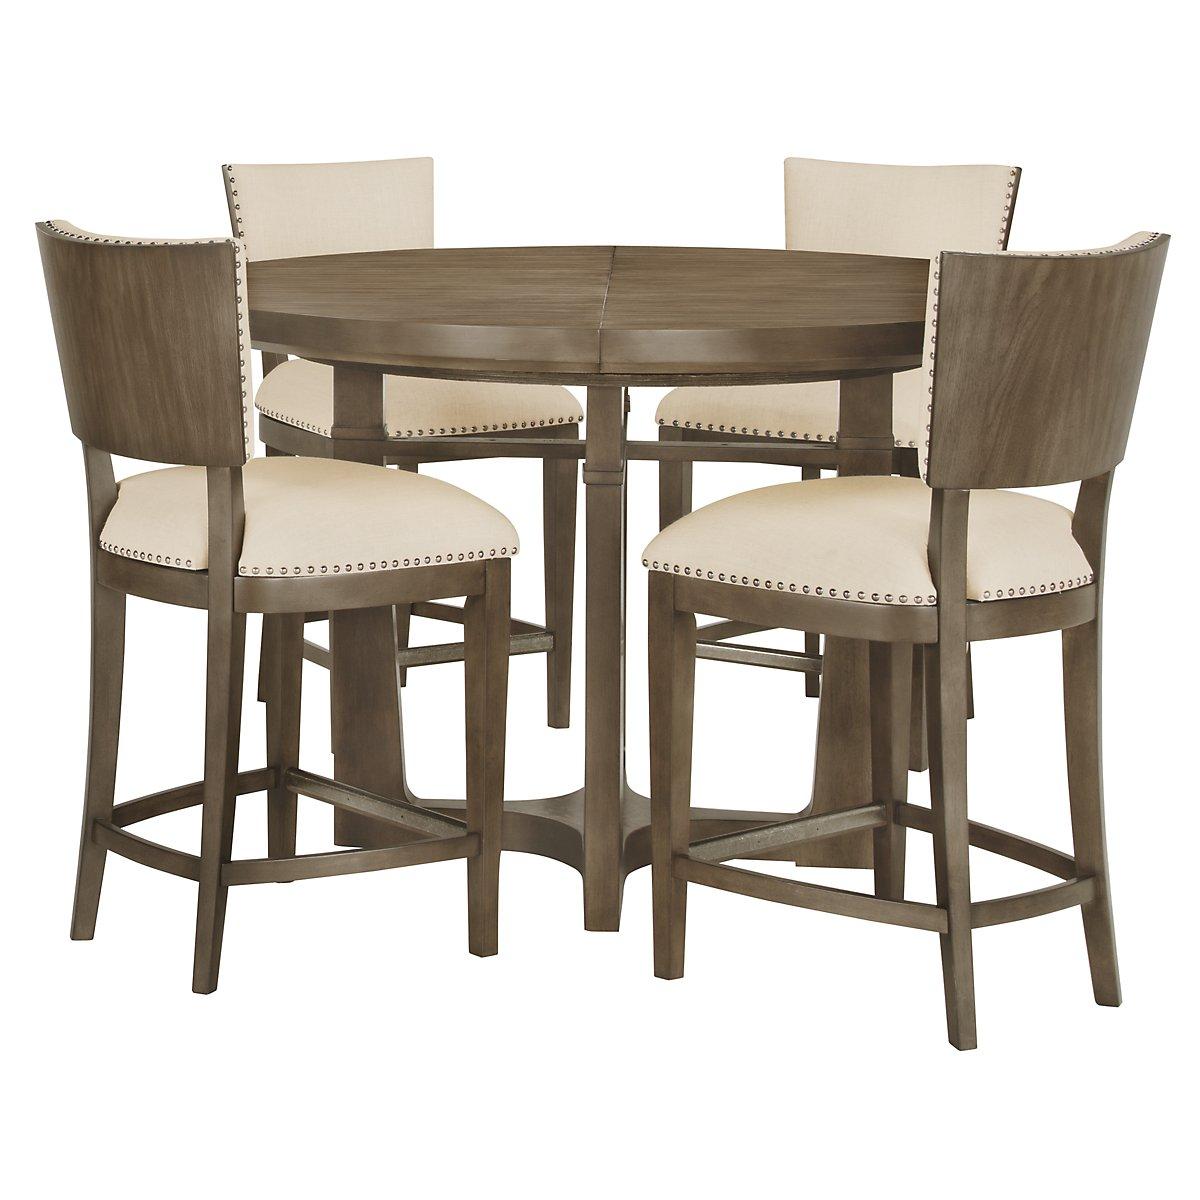 Preston Gray Wood High Table & 4 Upholstered Barstools